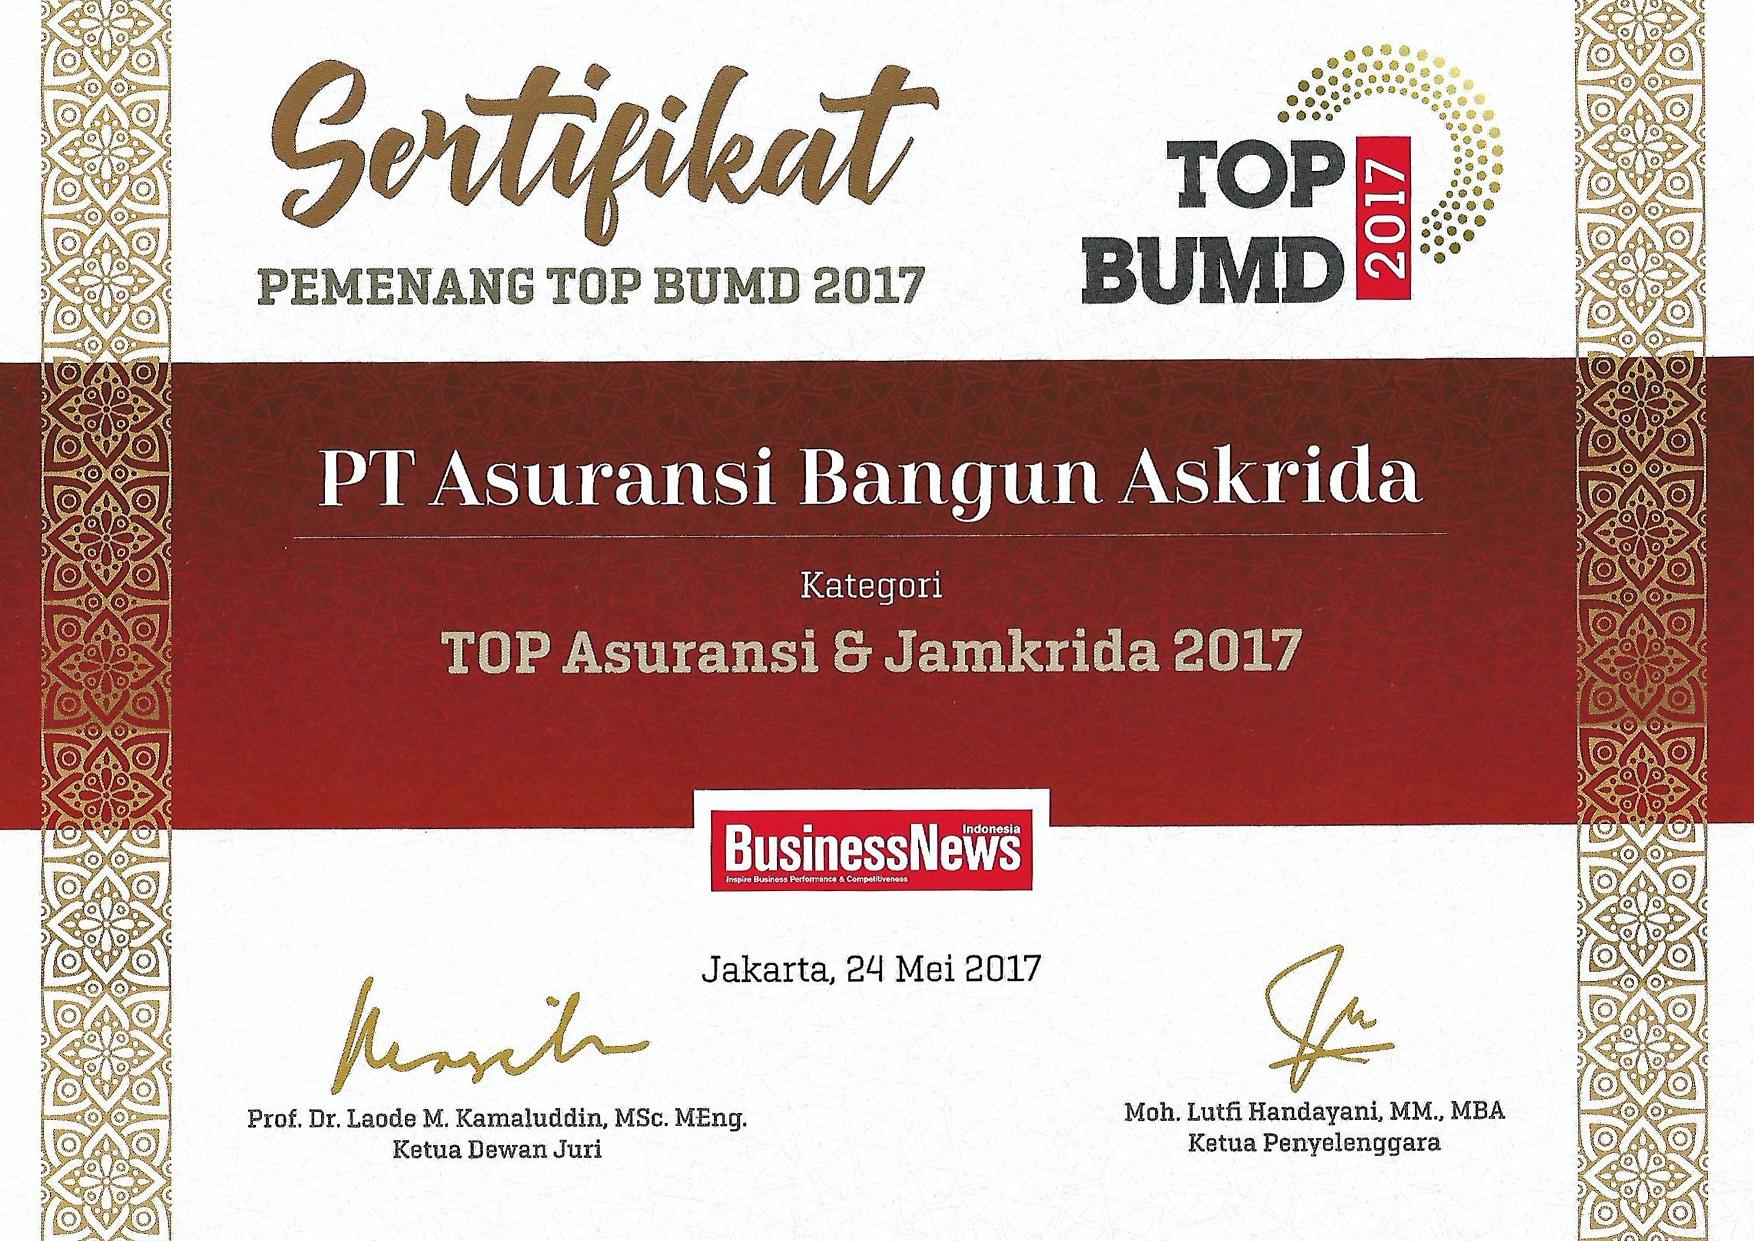 PENGHARGAAN TOP ASURANSI & JAMKRIDA 2017 (BusinessNews Indonesia)